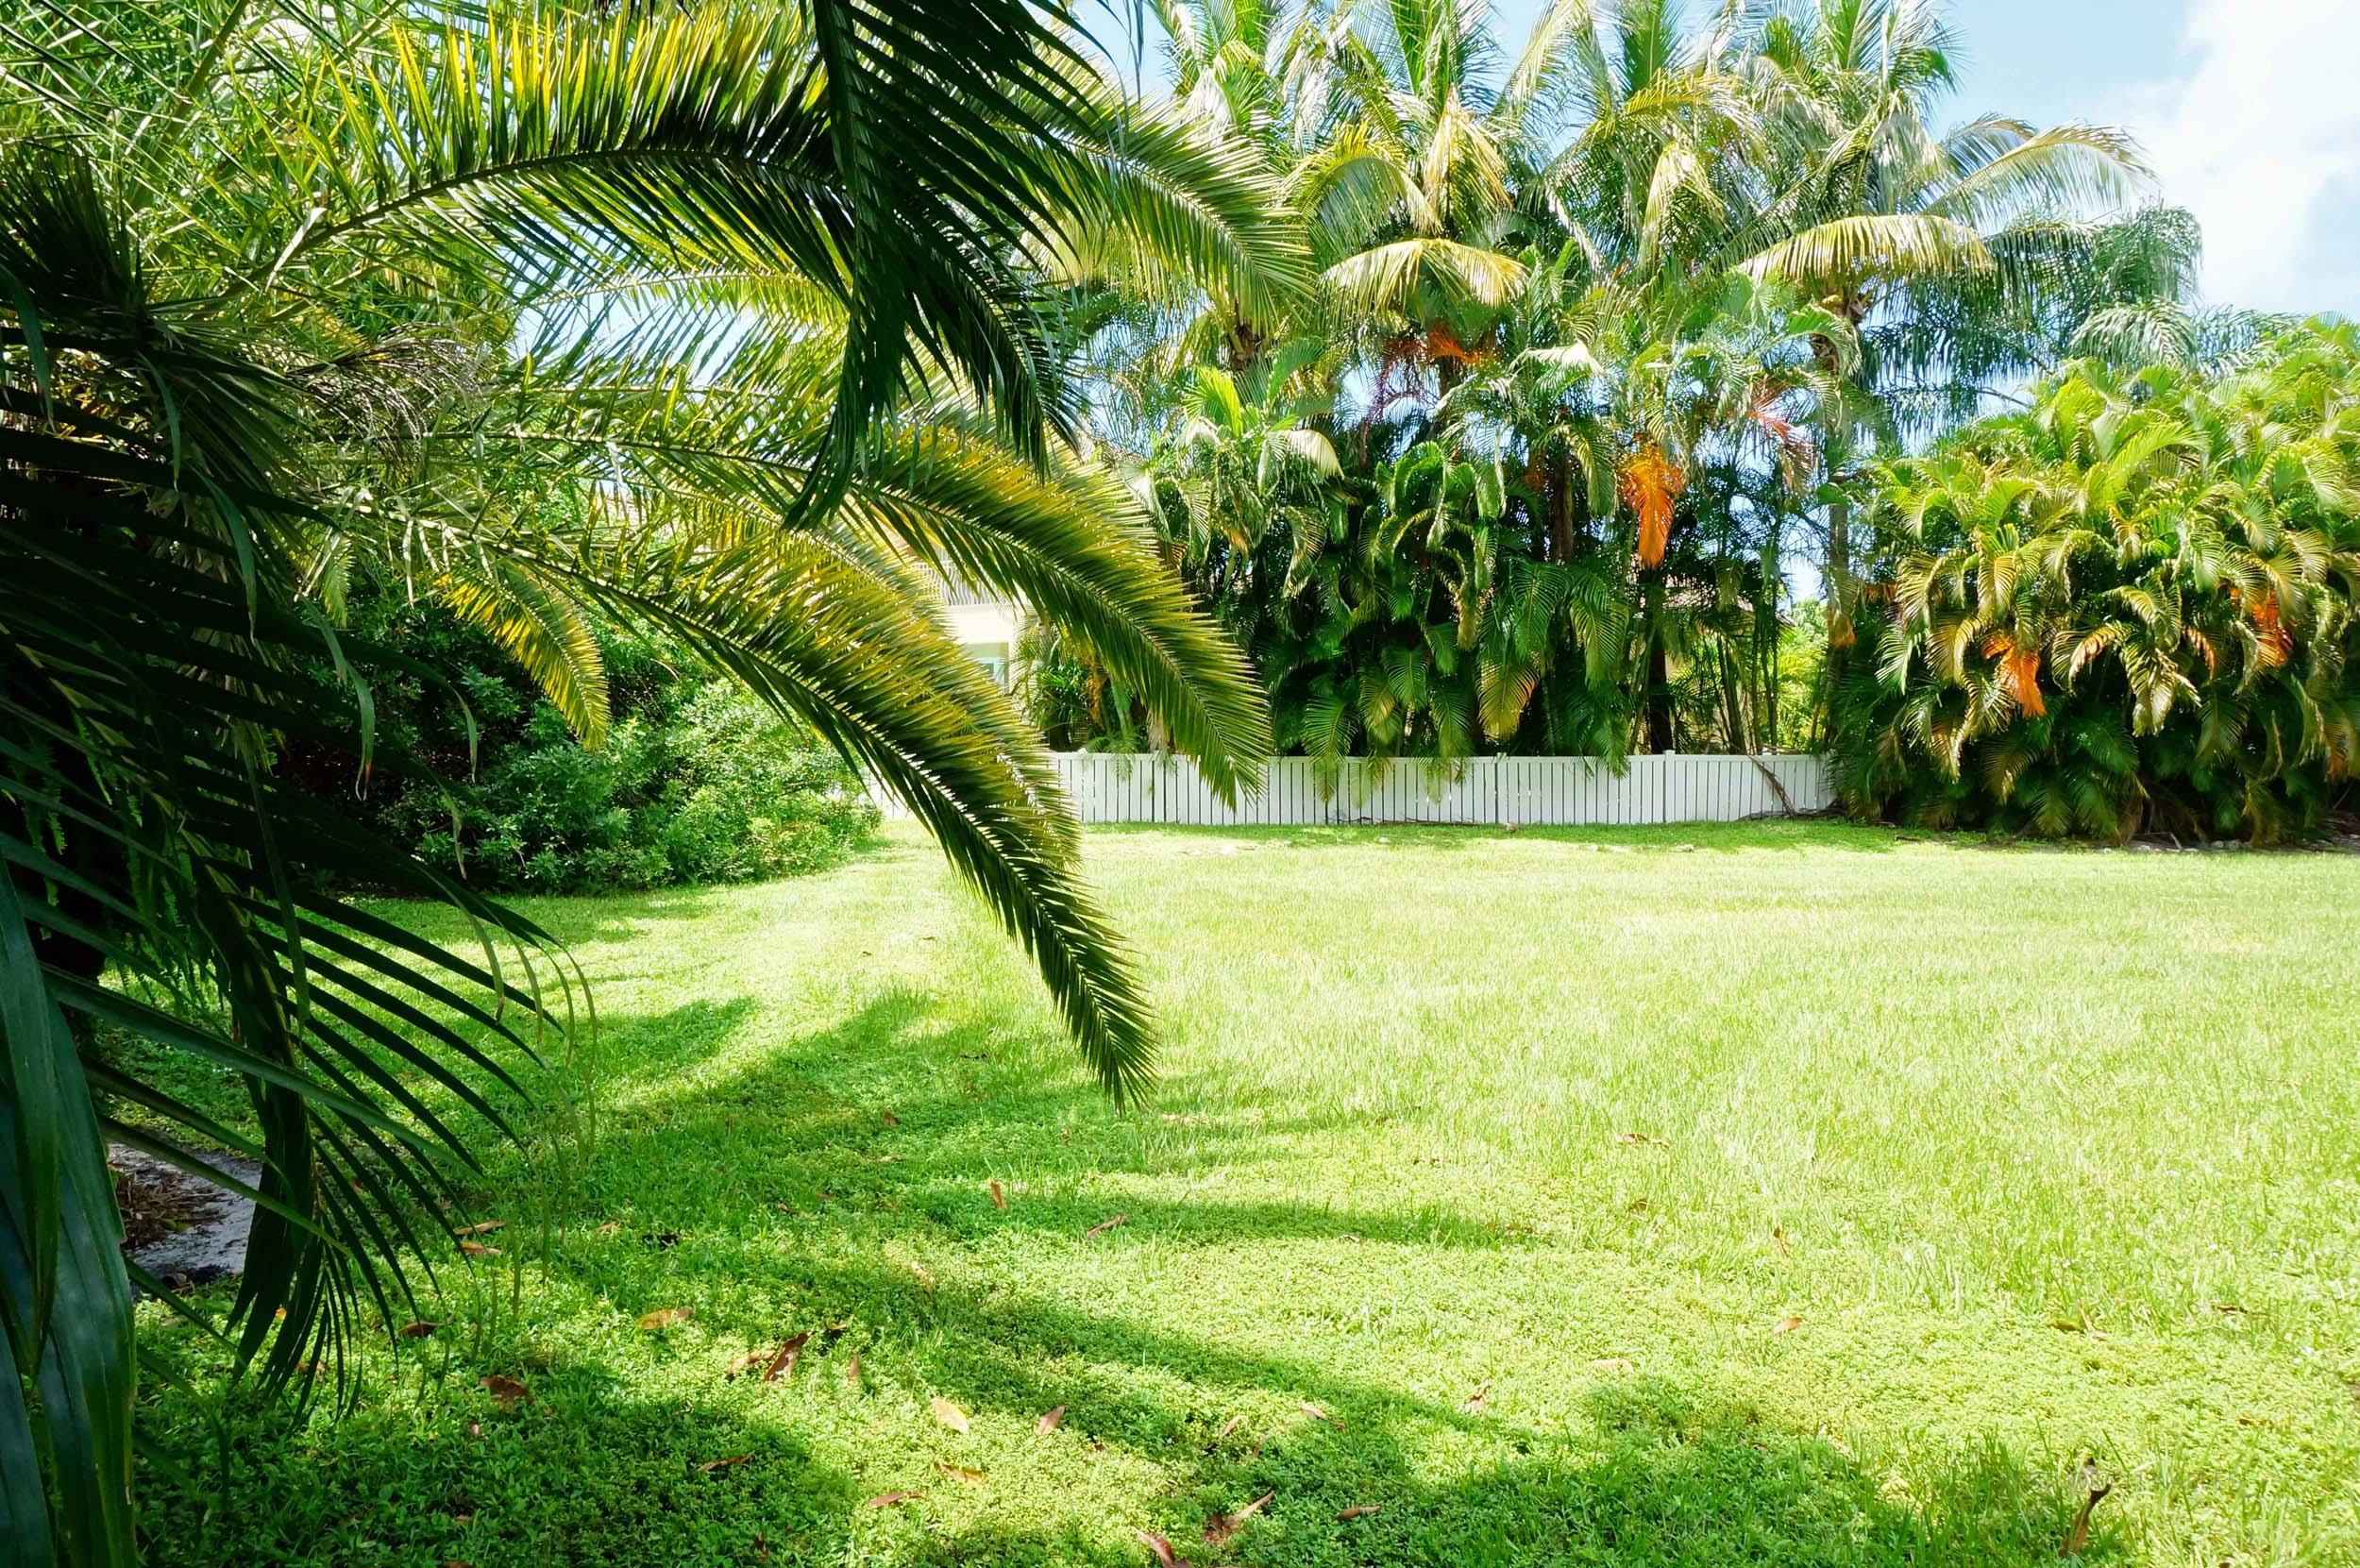 Mature Areca Palms, Bamboo, Ficus